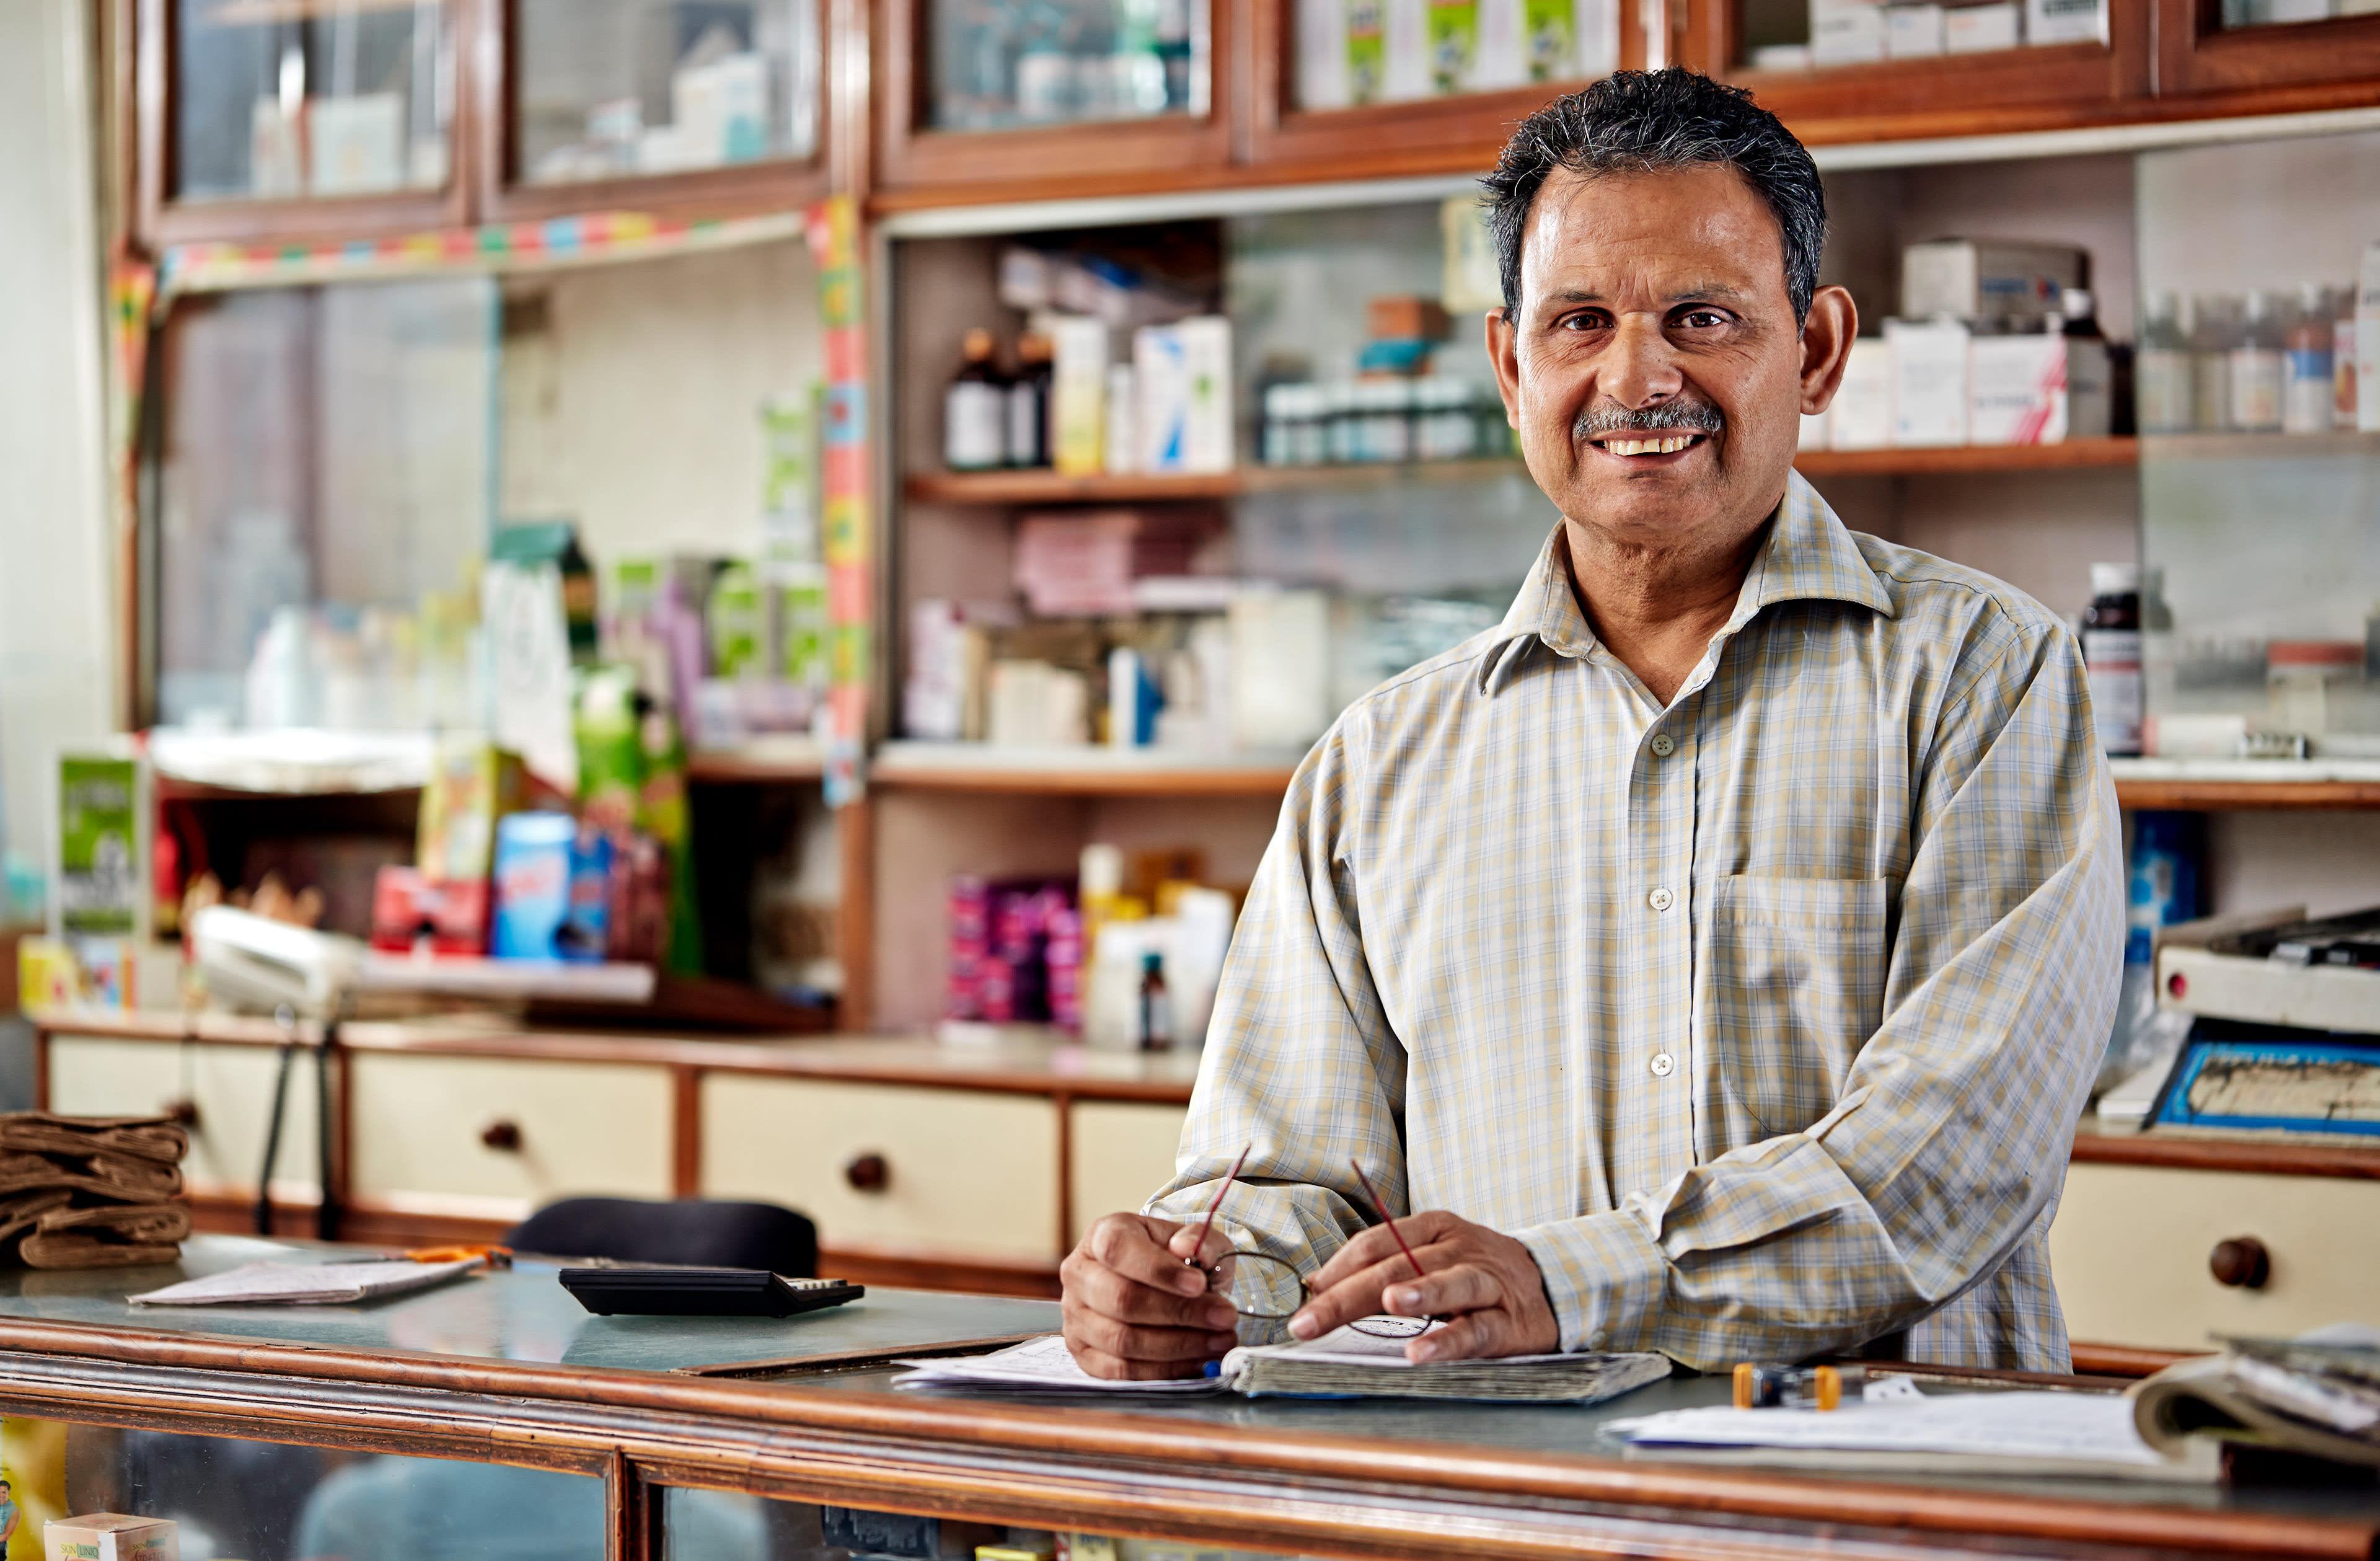 Richard Moran GSK Global Stories Lifestyle Pharma 018